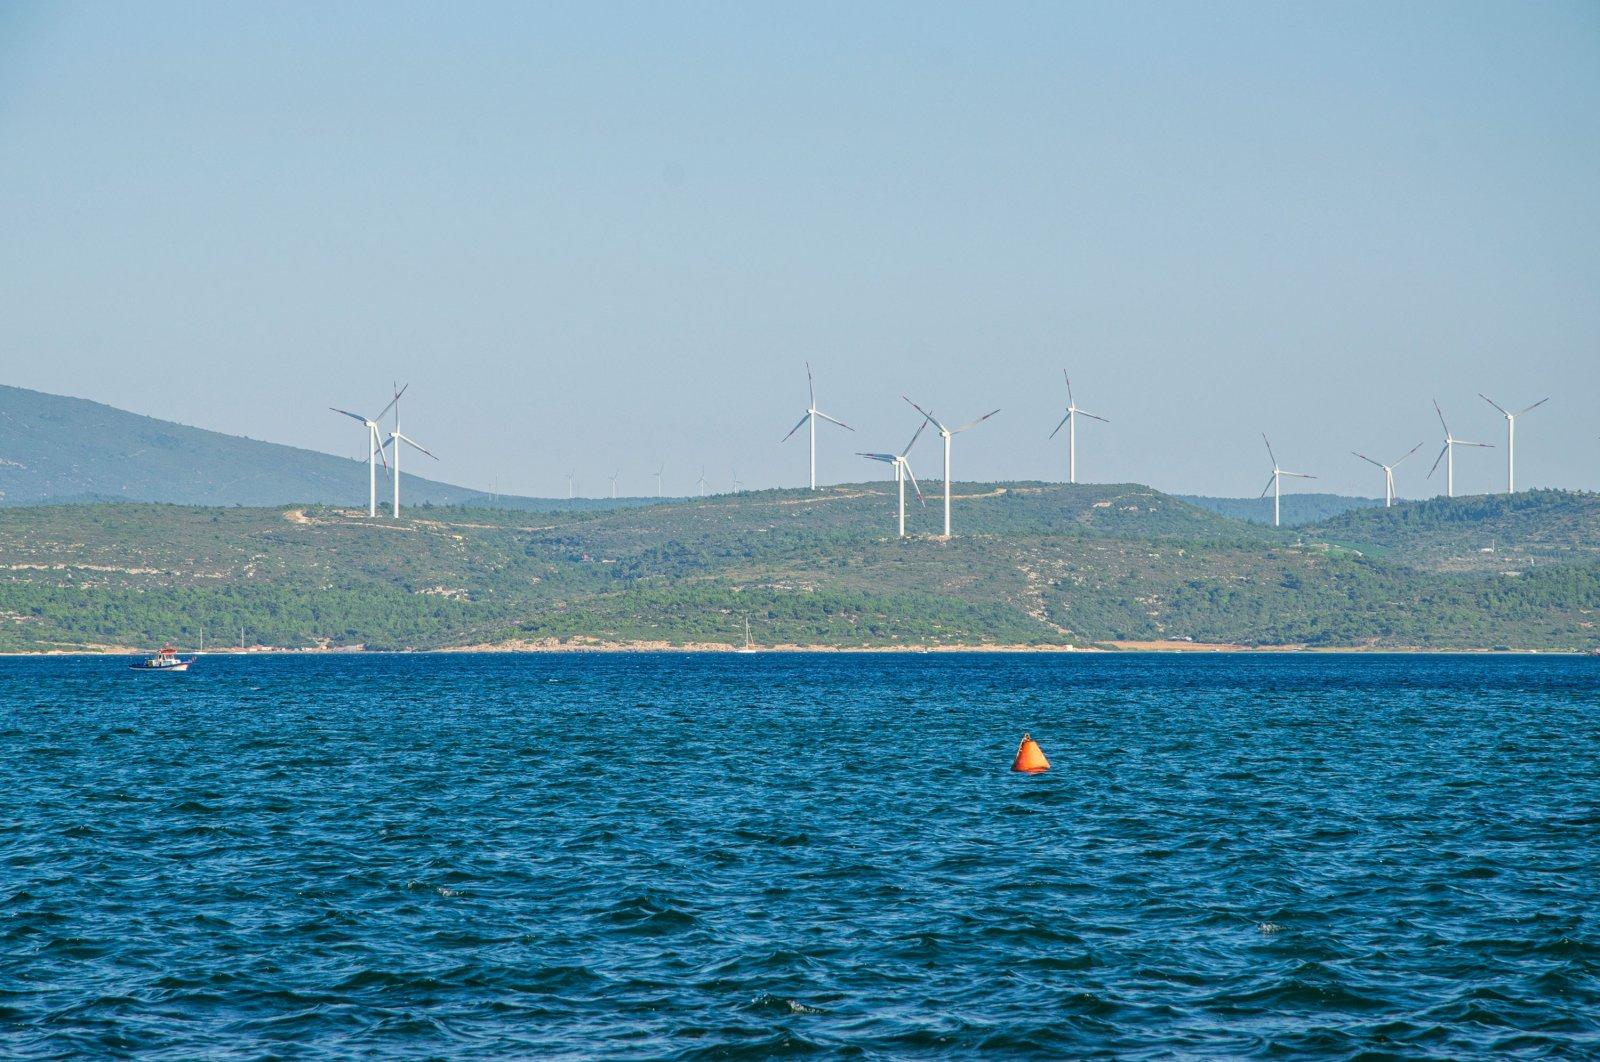 Wind turbines are seen in Sığacık, a seaside neighborhood of Seferihisar district in the western province of Izmir, Turkey, Dec. 14, 2020. (Shutterstock Photo)